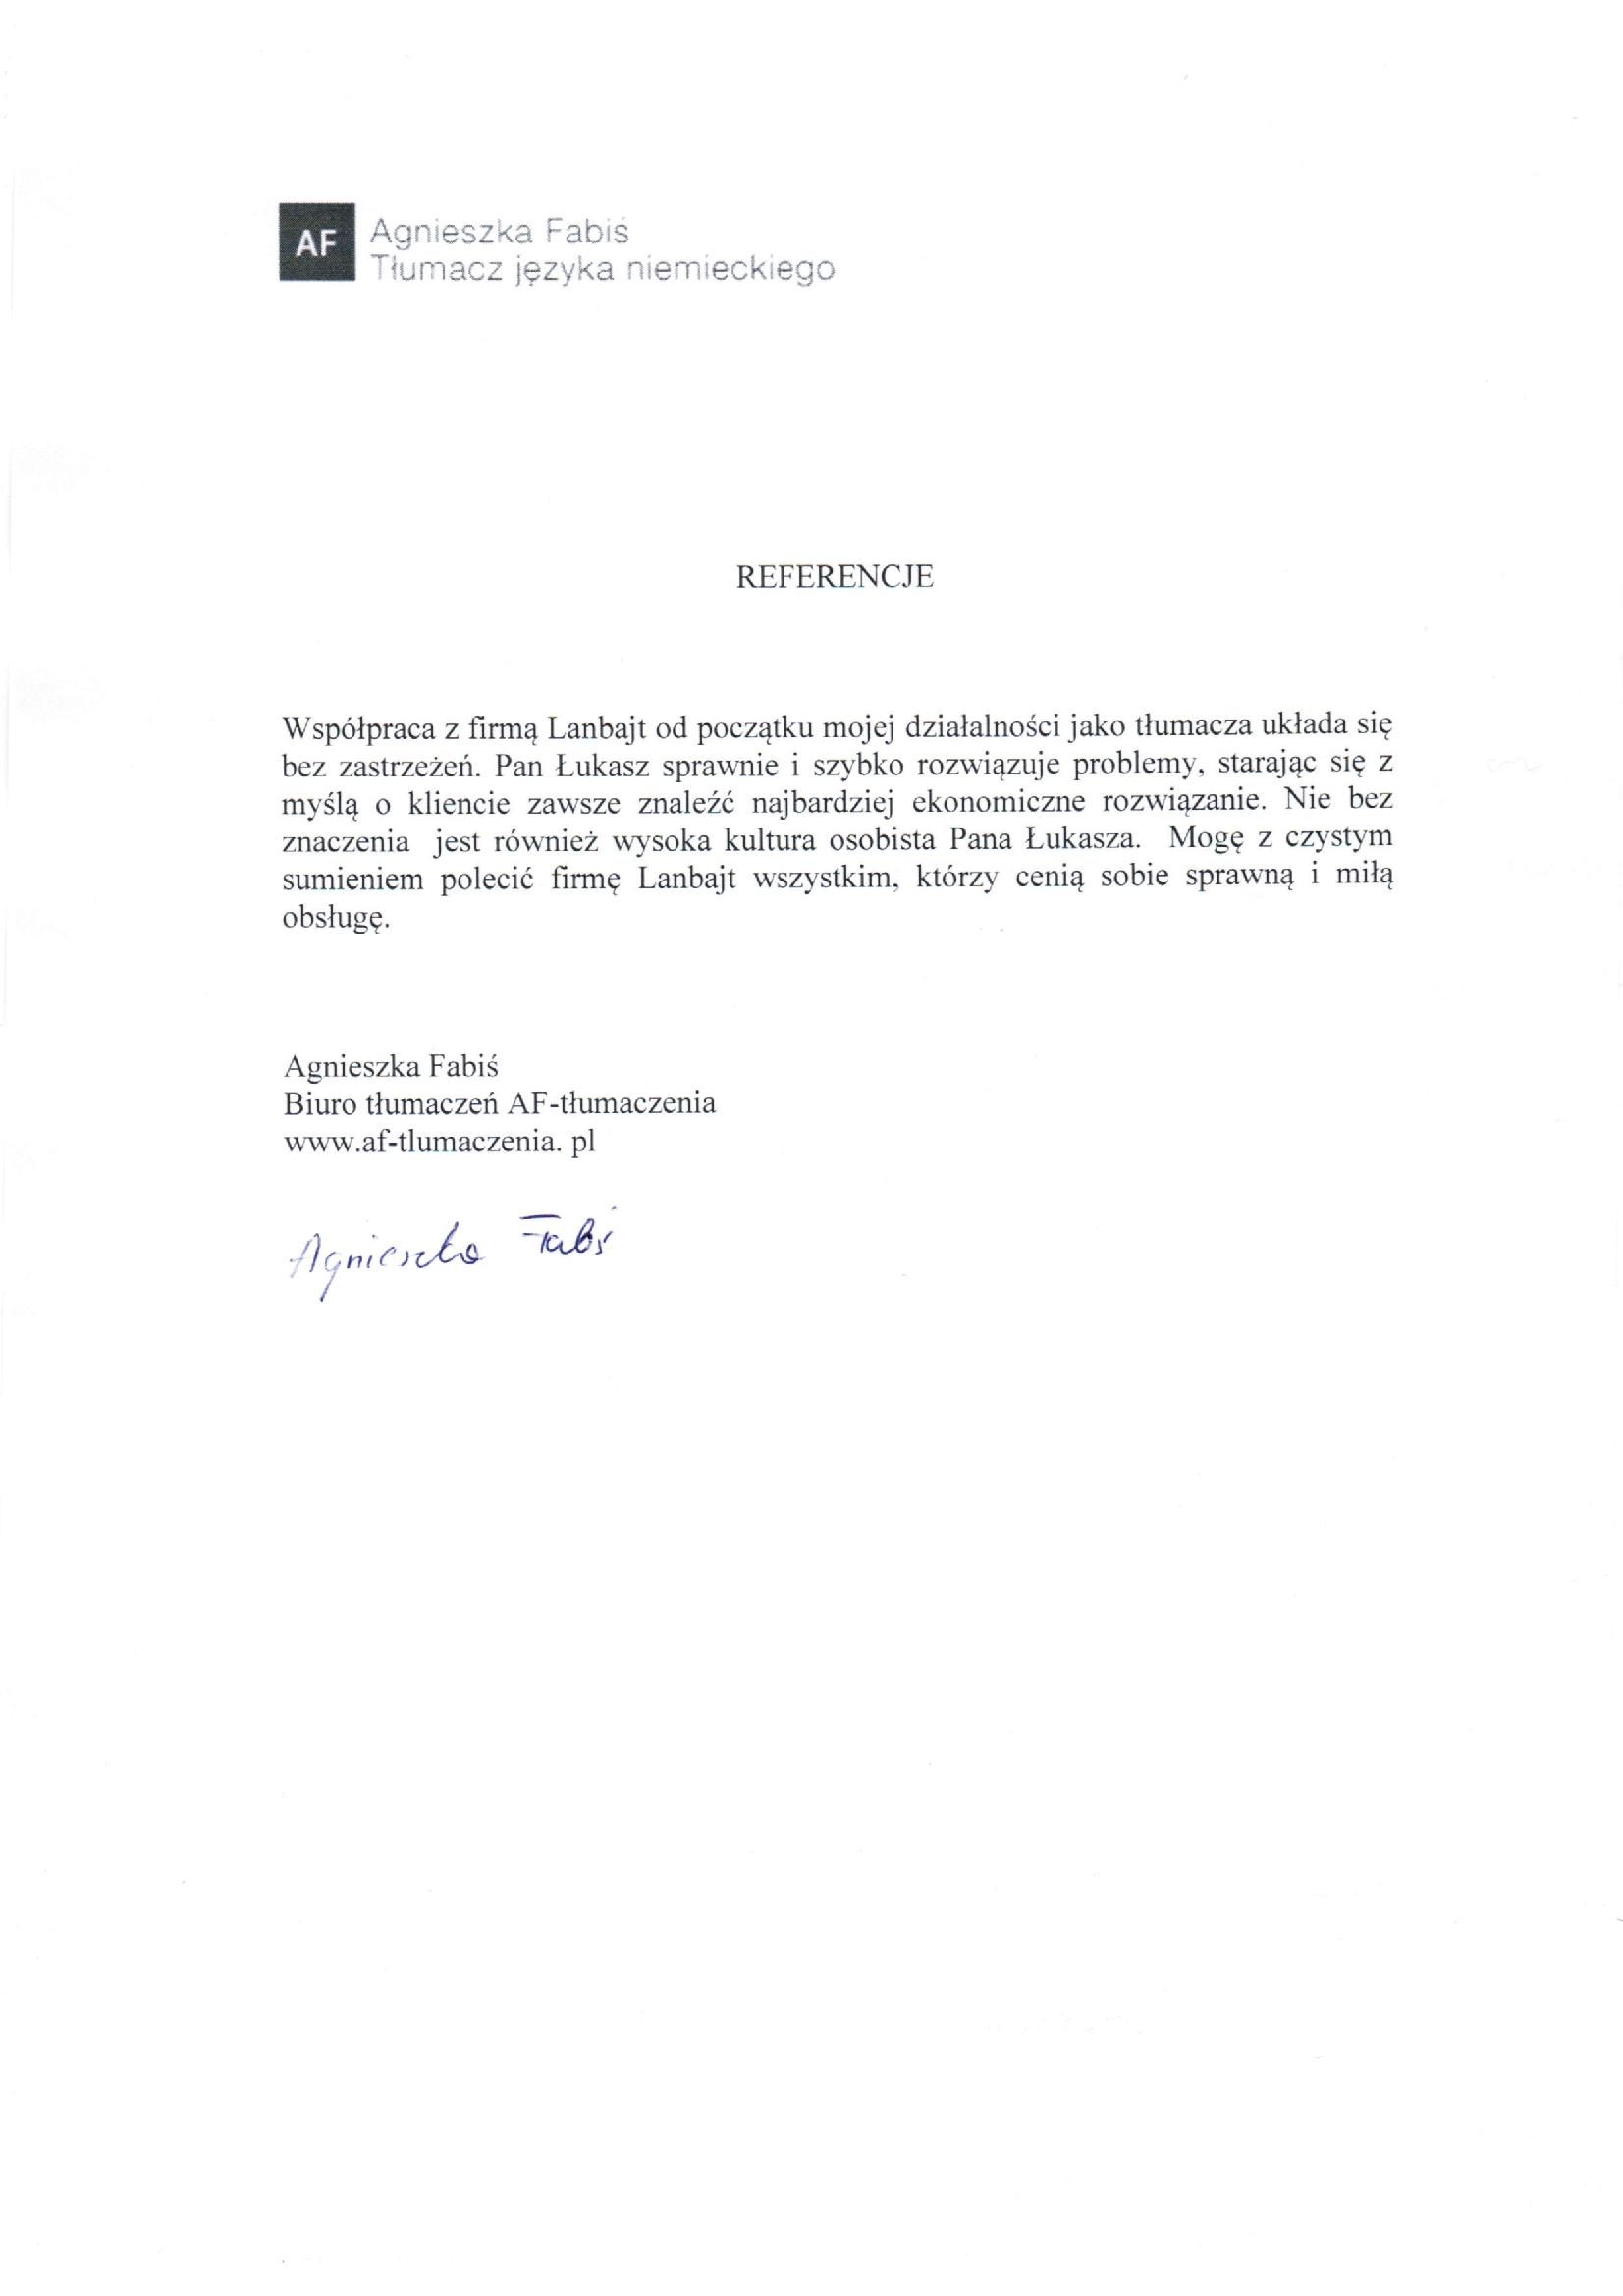 referencje_Lanbajt1